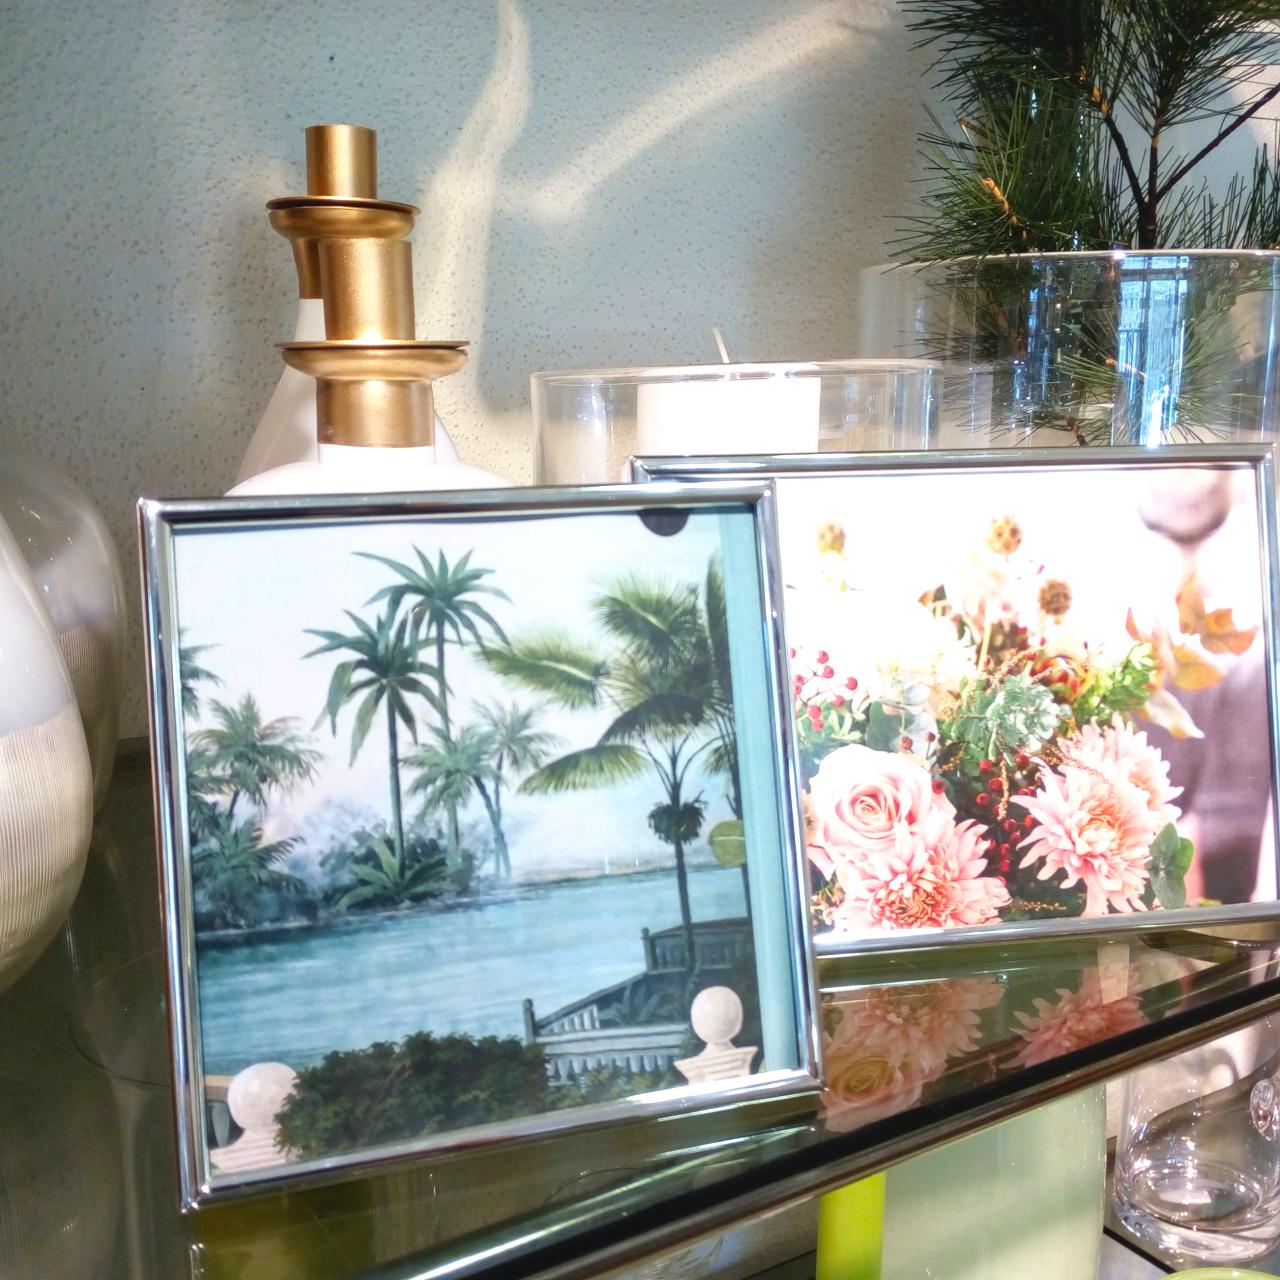 Wohnstudio Dekoration Geschenkideen Bilderrahmen Vasen Blumen Glas Quadrat